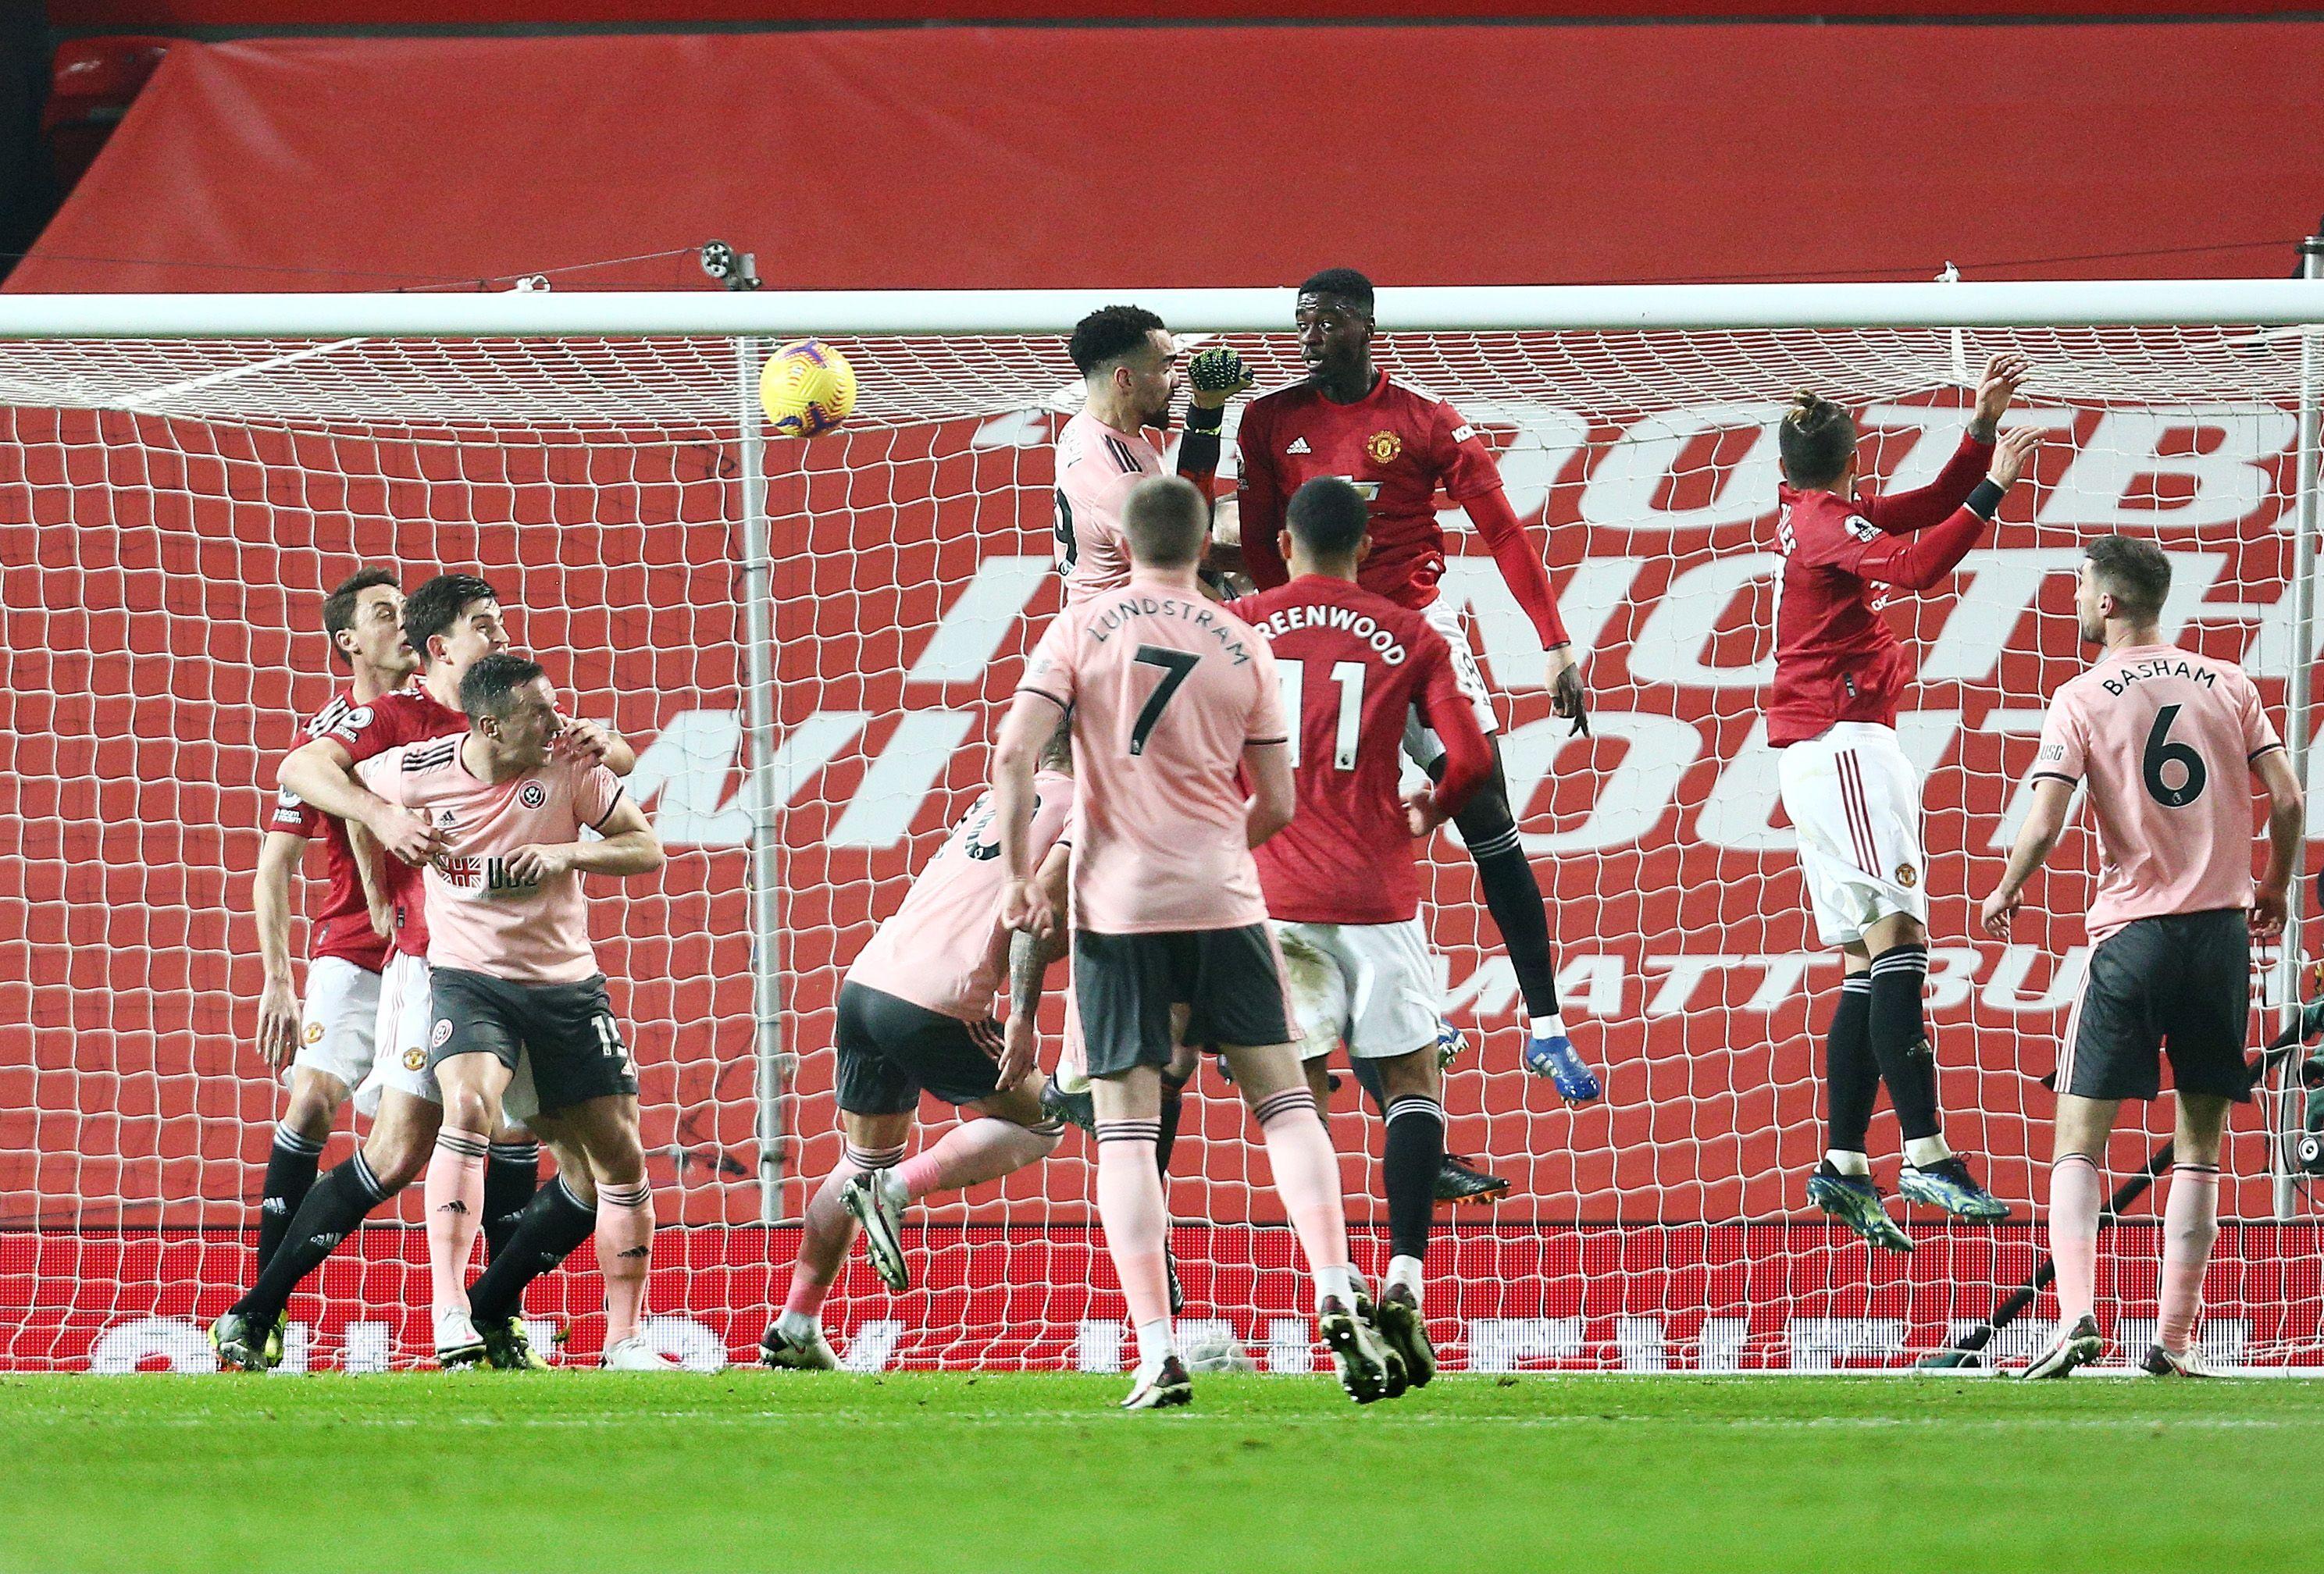 KAKVA SENZACIJA! Fenjeraš šokirao Old Trafford, velikoj seriji došao kraj